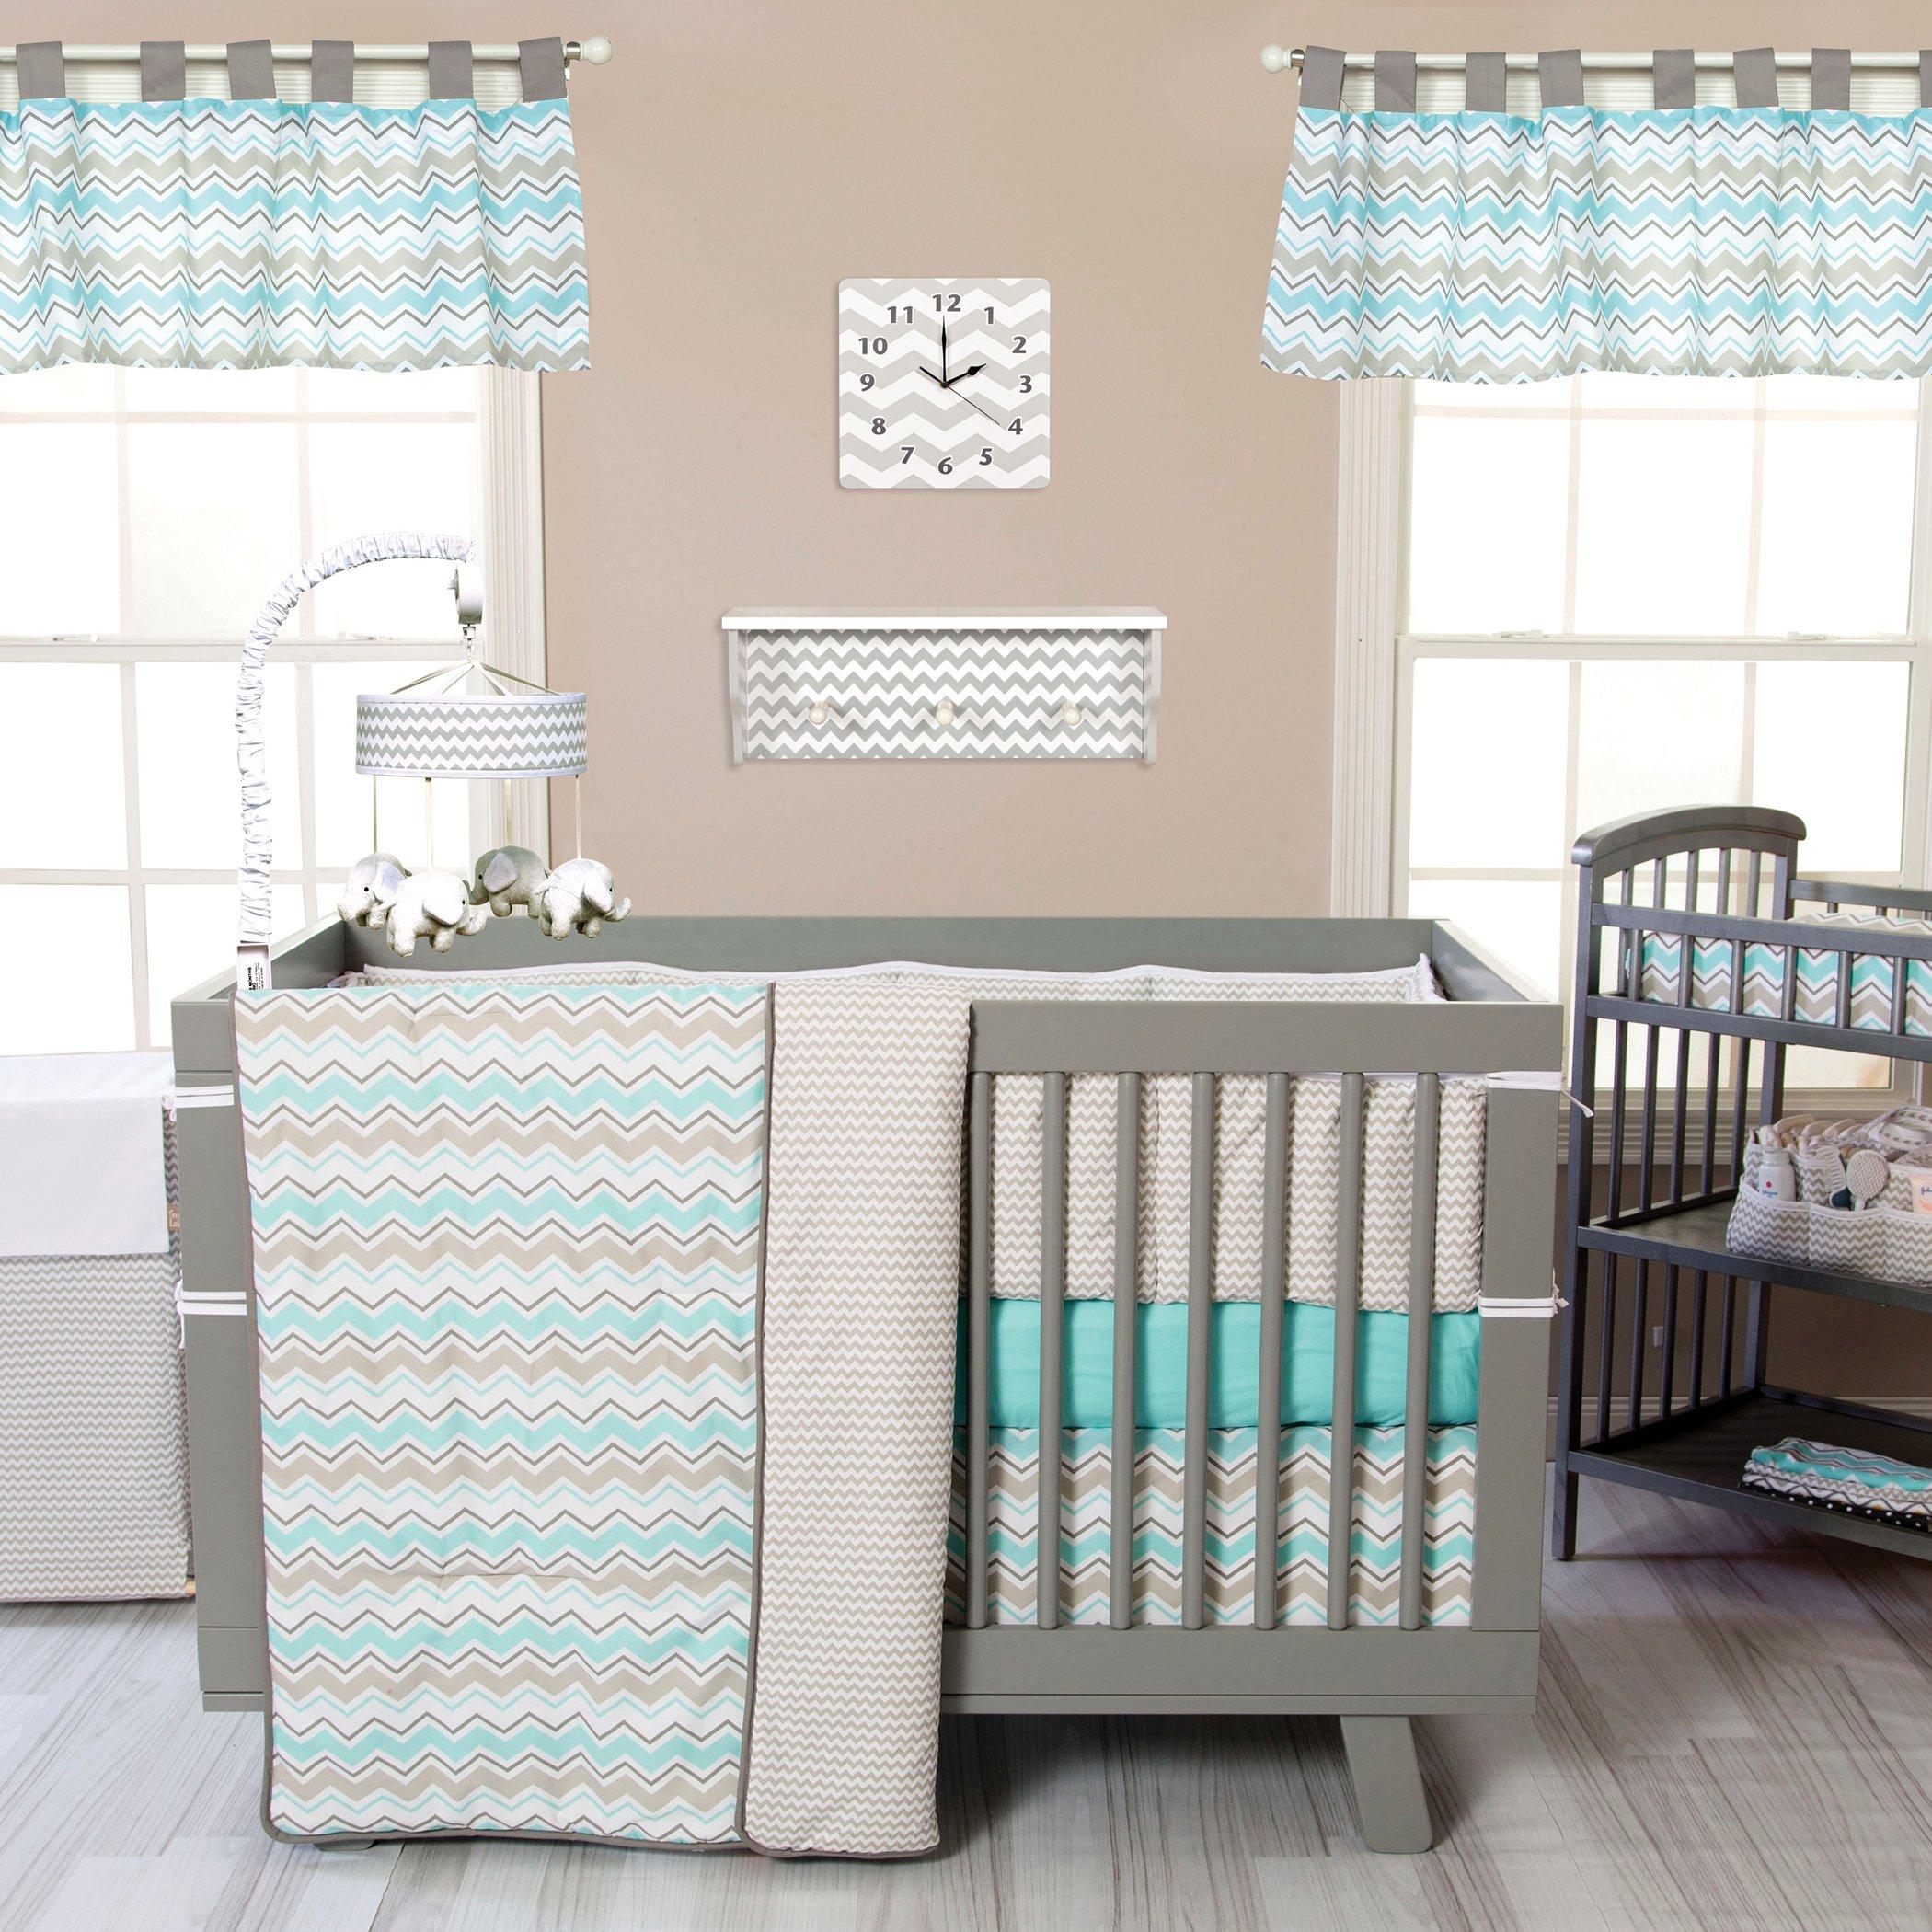 Trend Lab Seashore Waves 3 Piece Crib Bedding Set, Teal